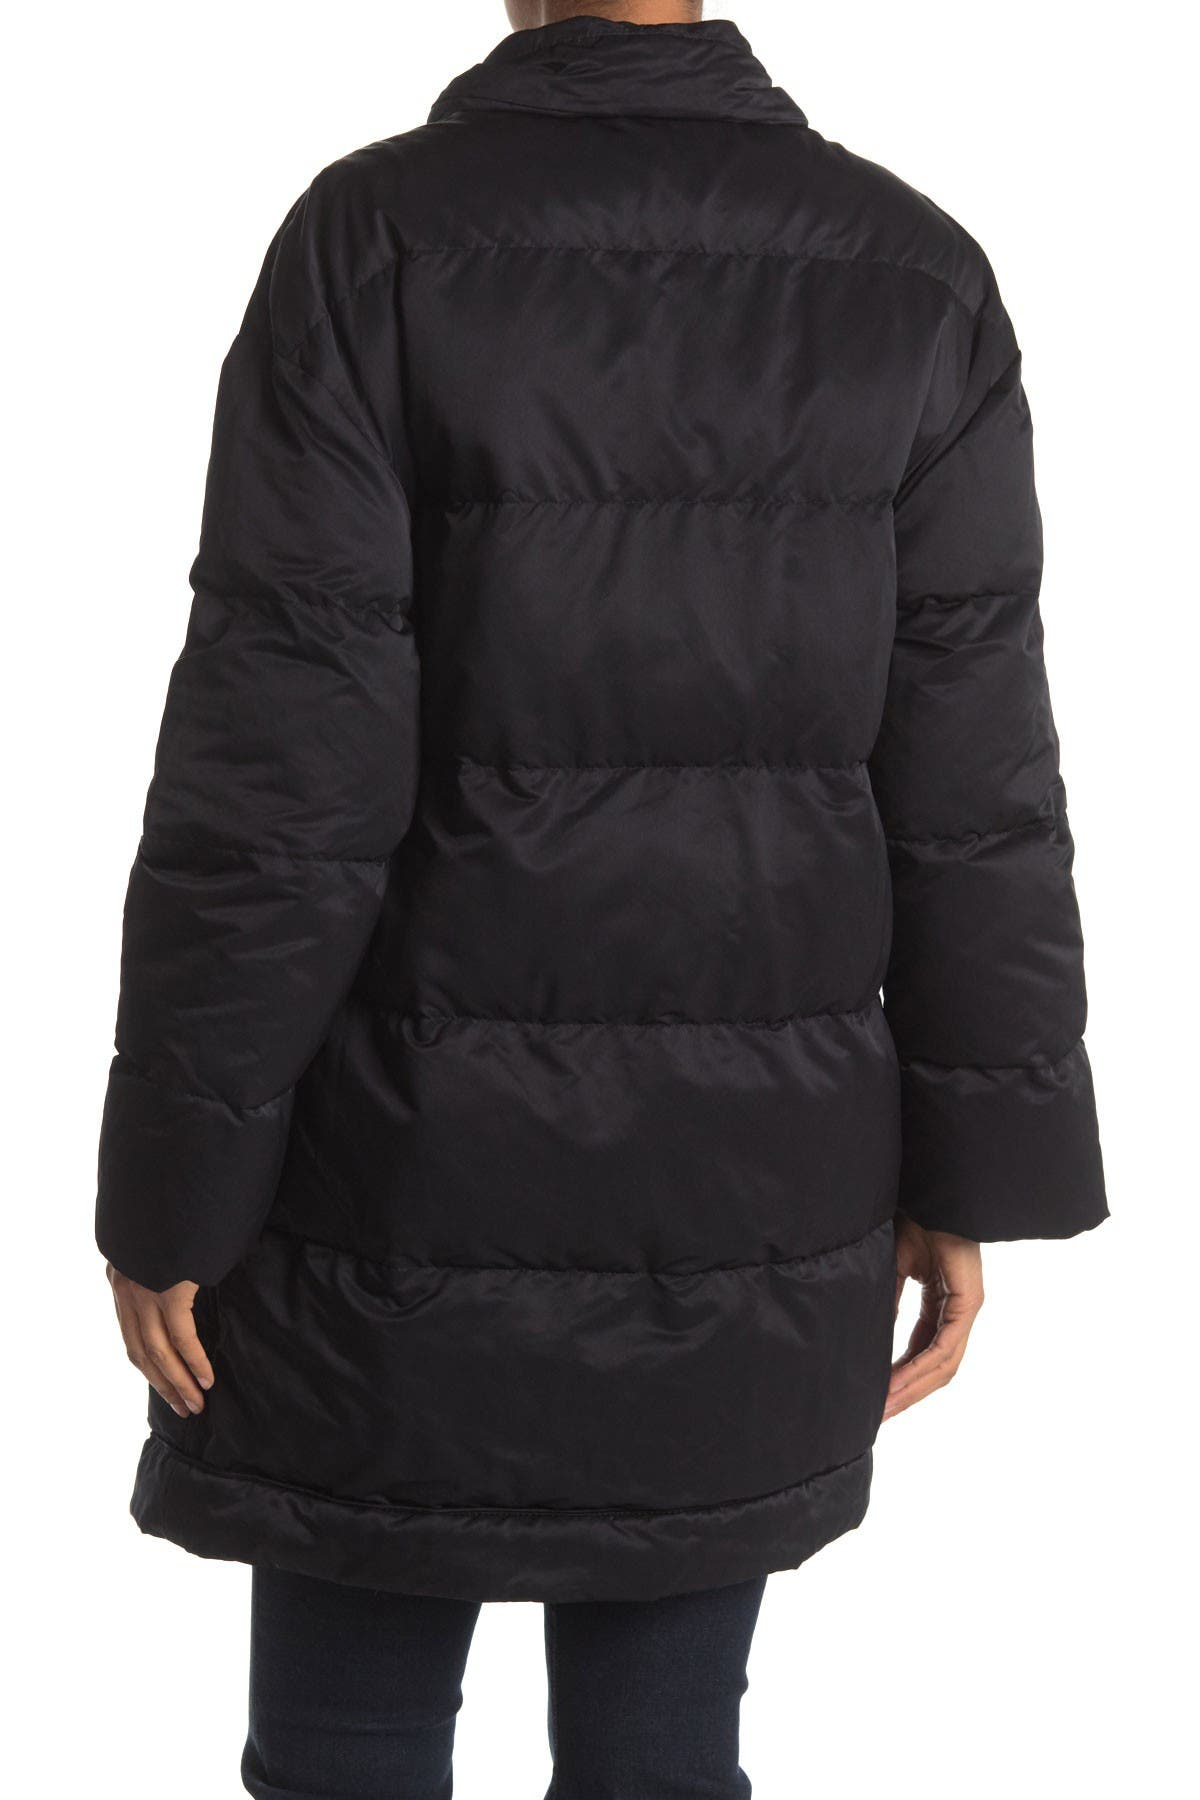 Image of ALLSAINTS Darling Buckle Strap Puffer Jacket